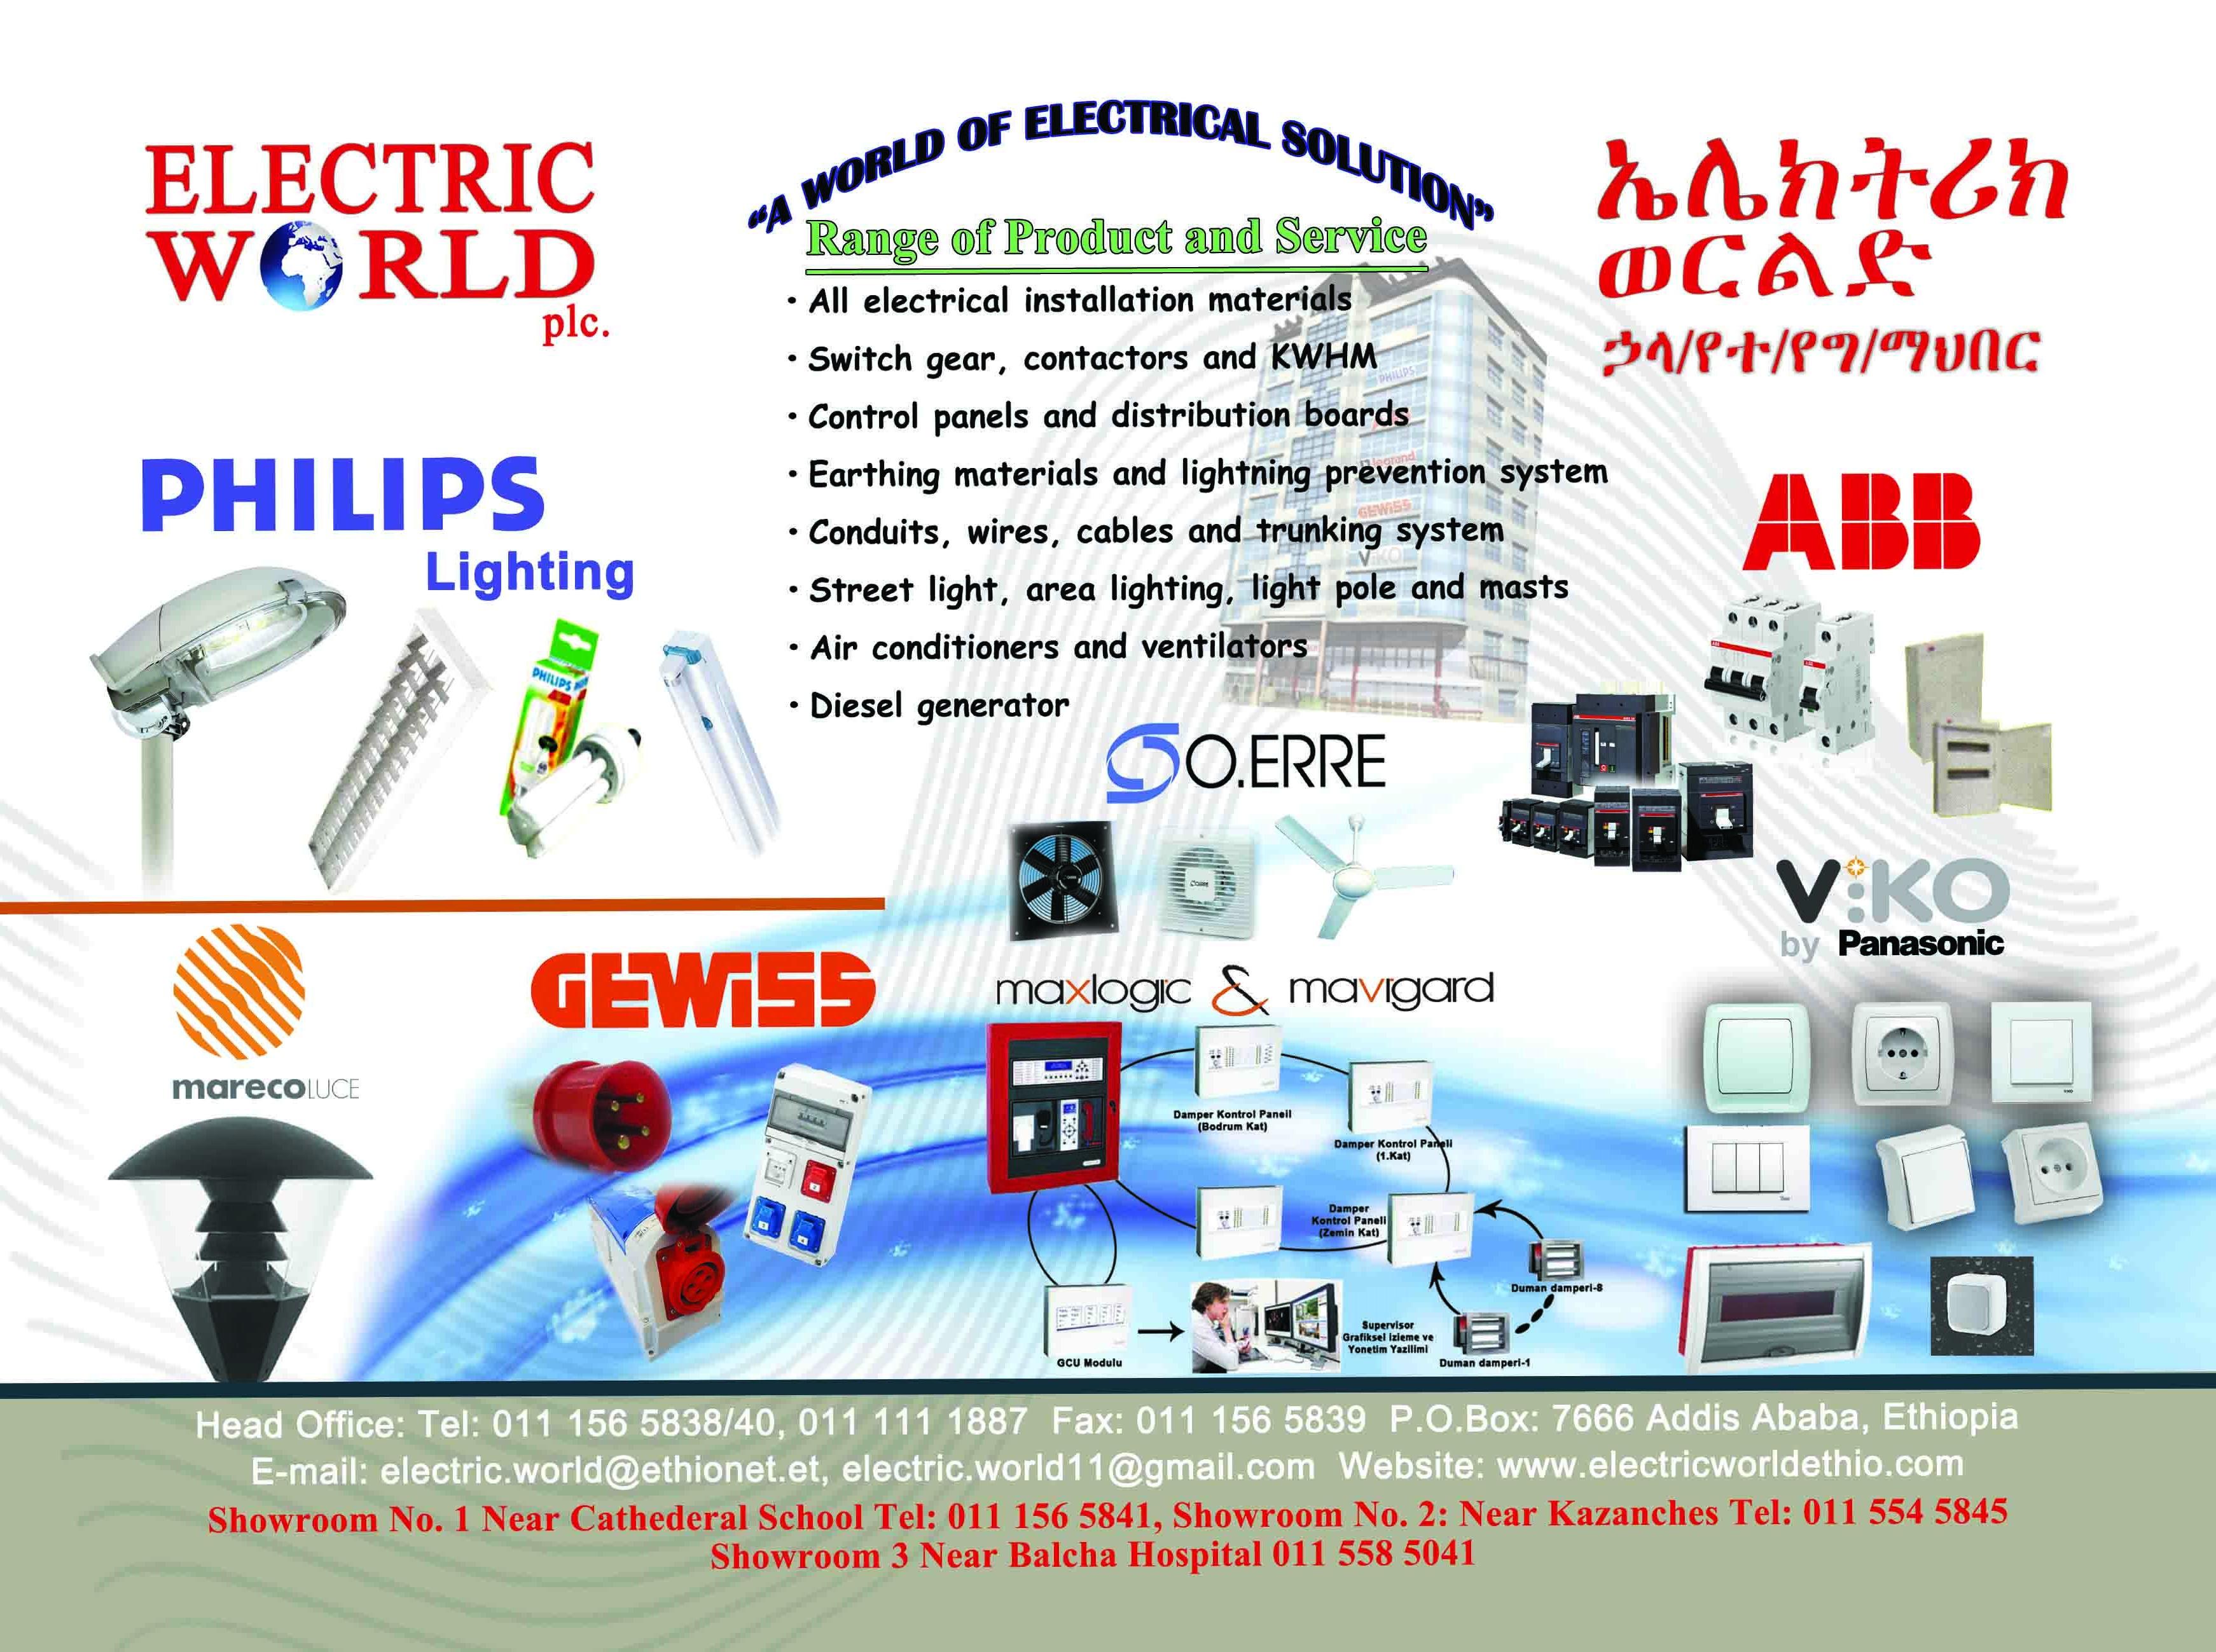 Electric World PLC